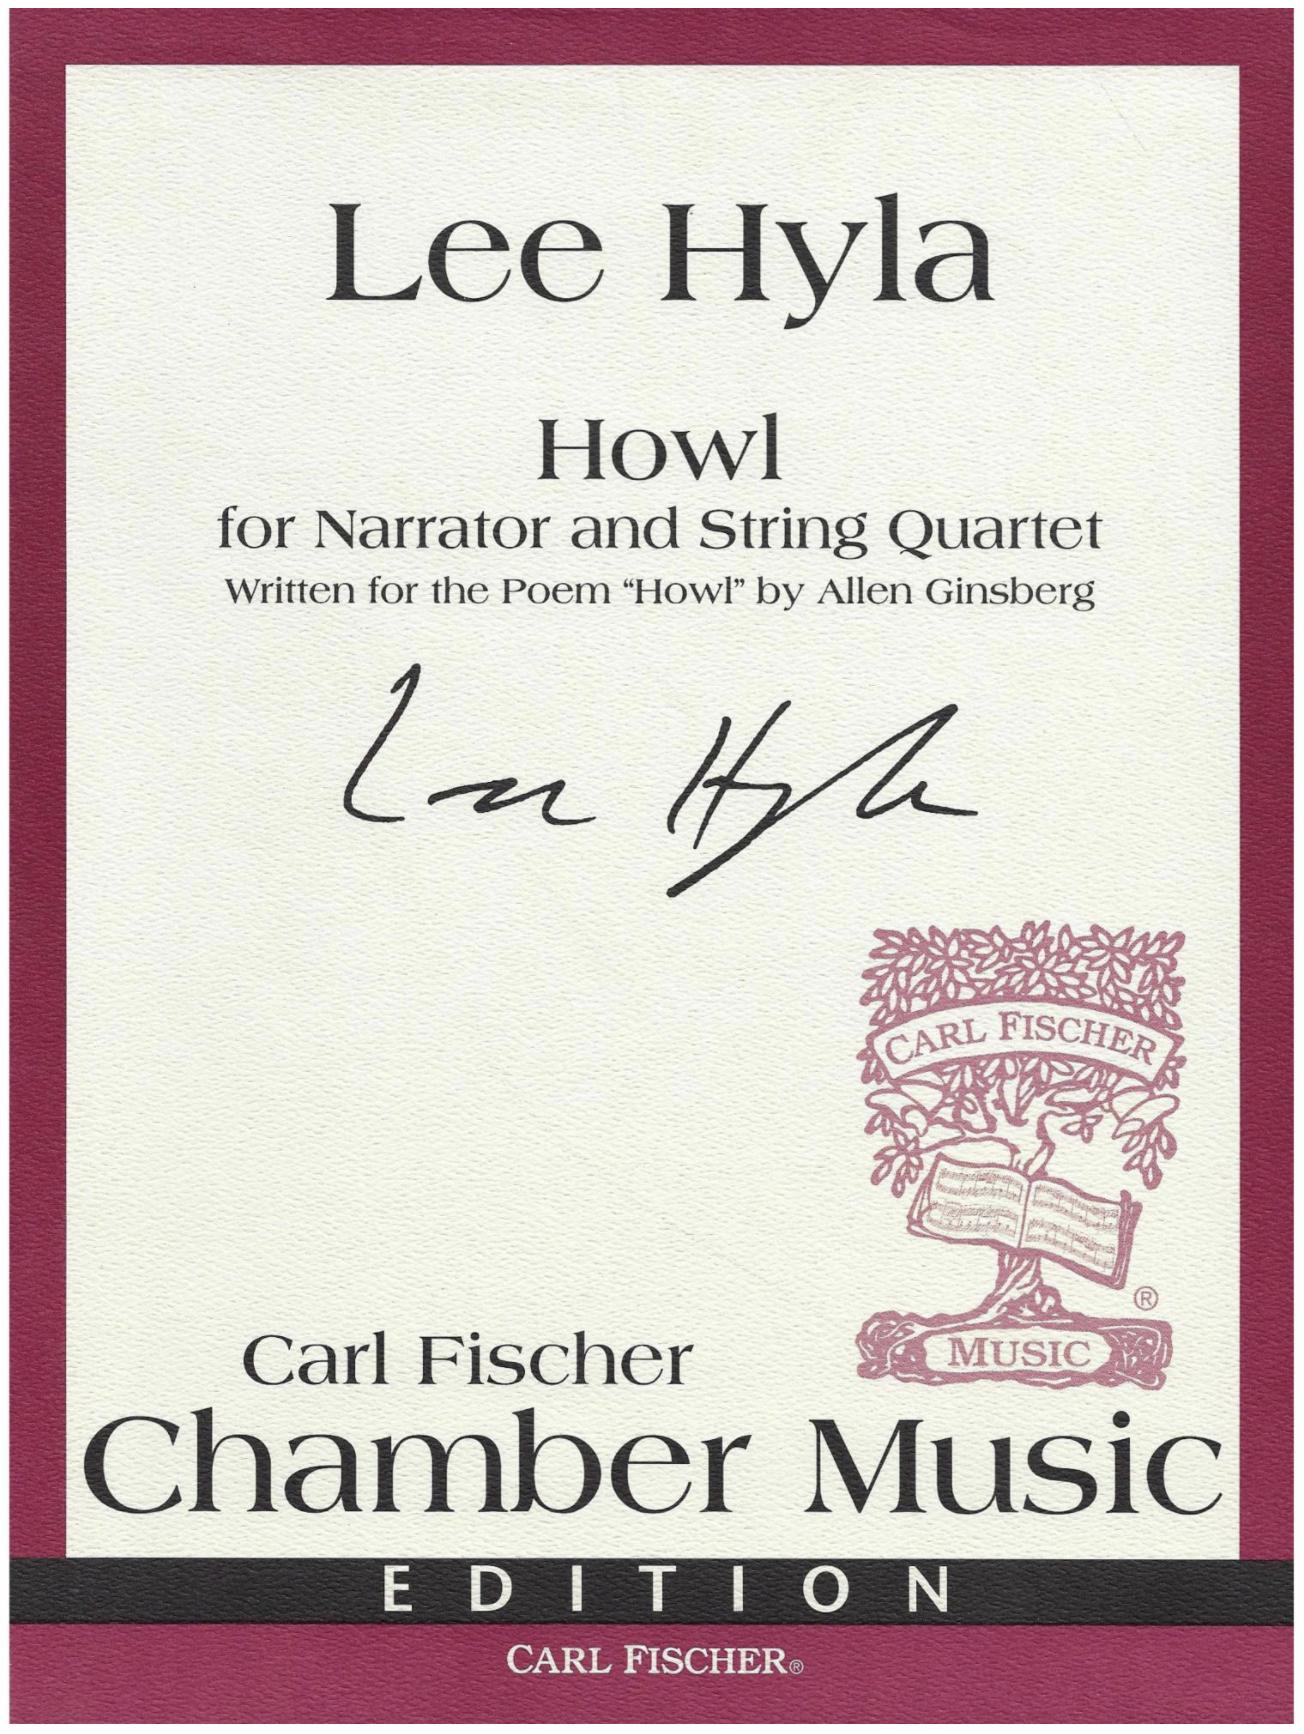 Carl Fischer Hyla, Lee: Howl for Narrator and String Quartet based on the poem by Allen Ginsberg (1993)